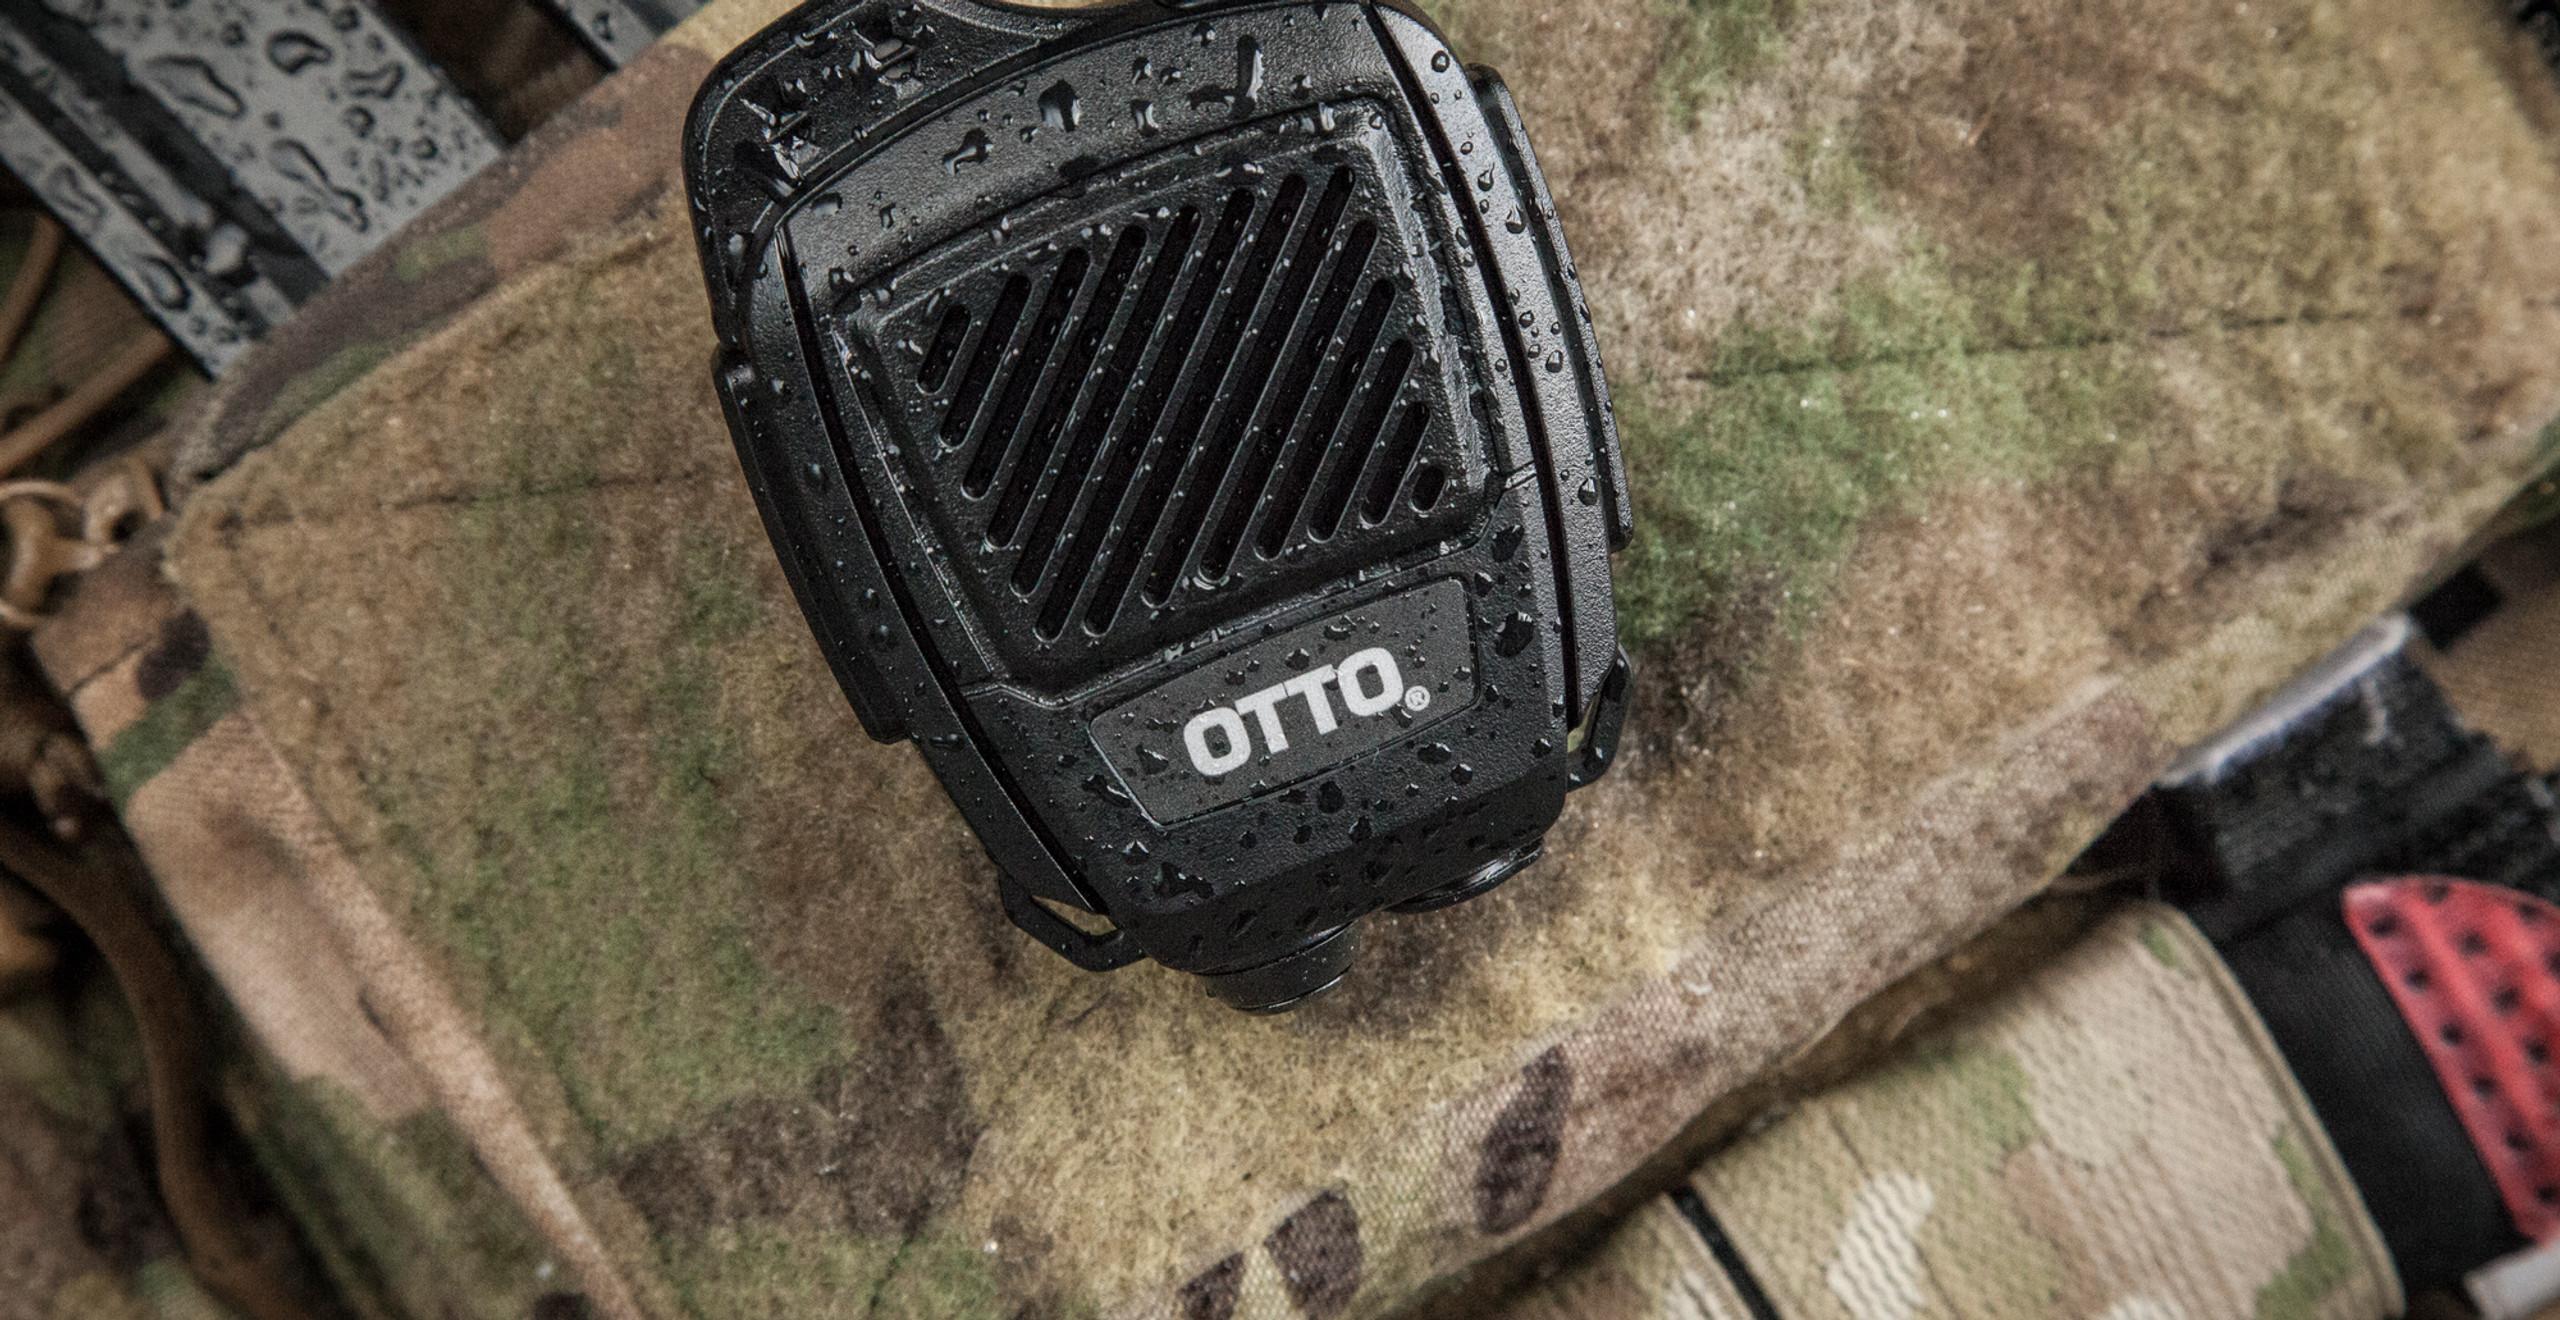 OTTO Bluetooth Revo NC2 Blackline simulations tactical zello accessories speaker microphone STD-MIL-810G airsoft milsim review